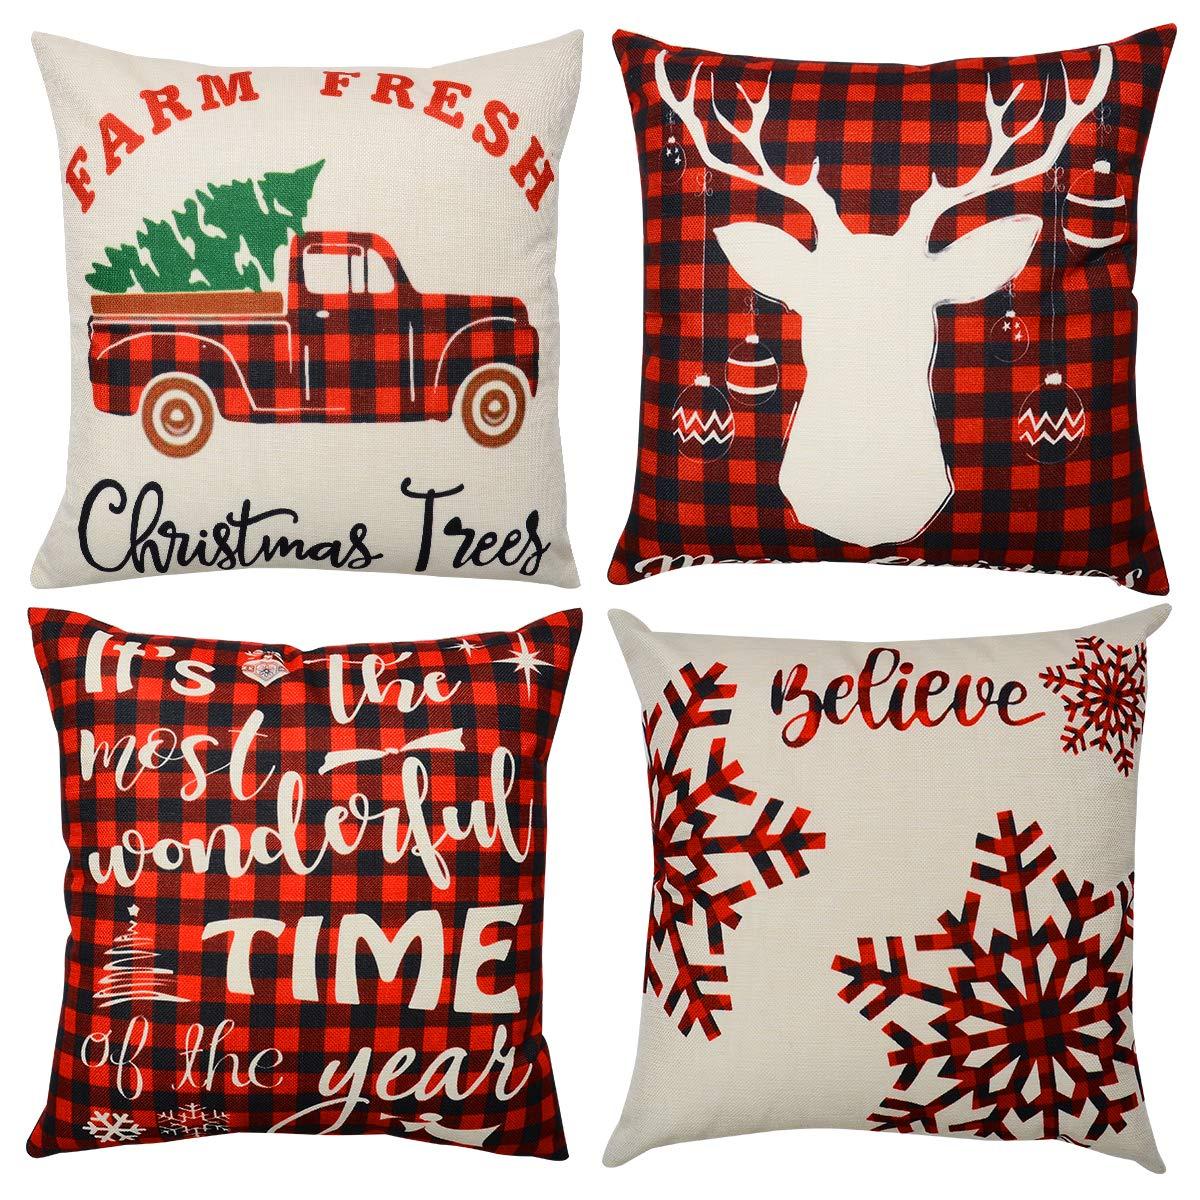 Merry Christmas Throw Pillow Case Xmas Velet Cushion Cover Sofa Car Decor US